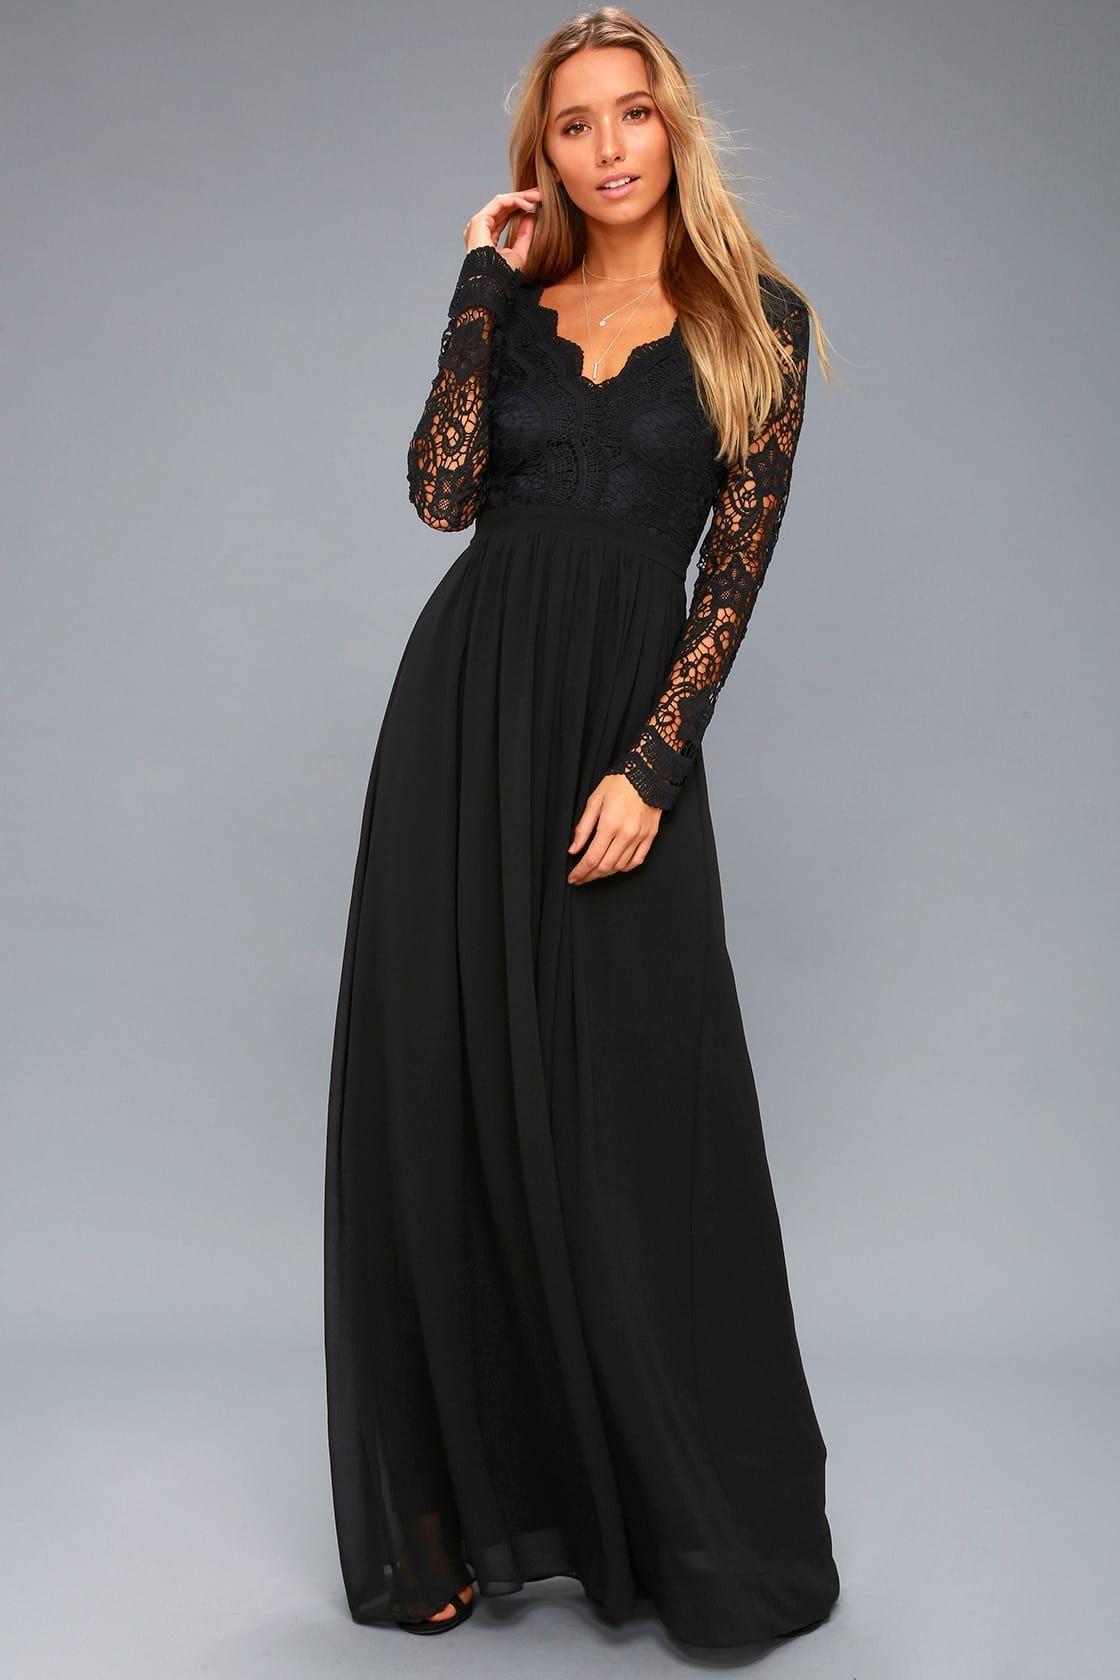 Lovely Black Dress Maxi Dress Lace Dress Gown In 2020 Long Sleeve Lace Maxi Dress Black Lace Dress Long Long Sleeve Dress Formal